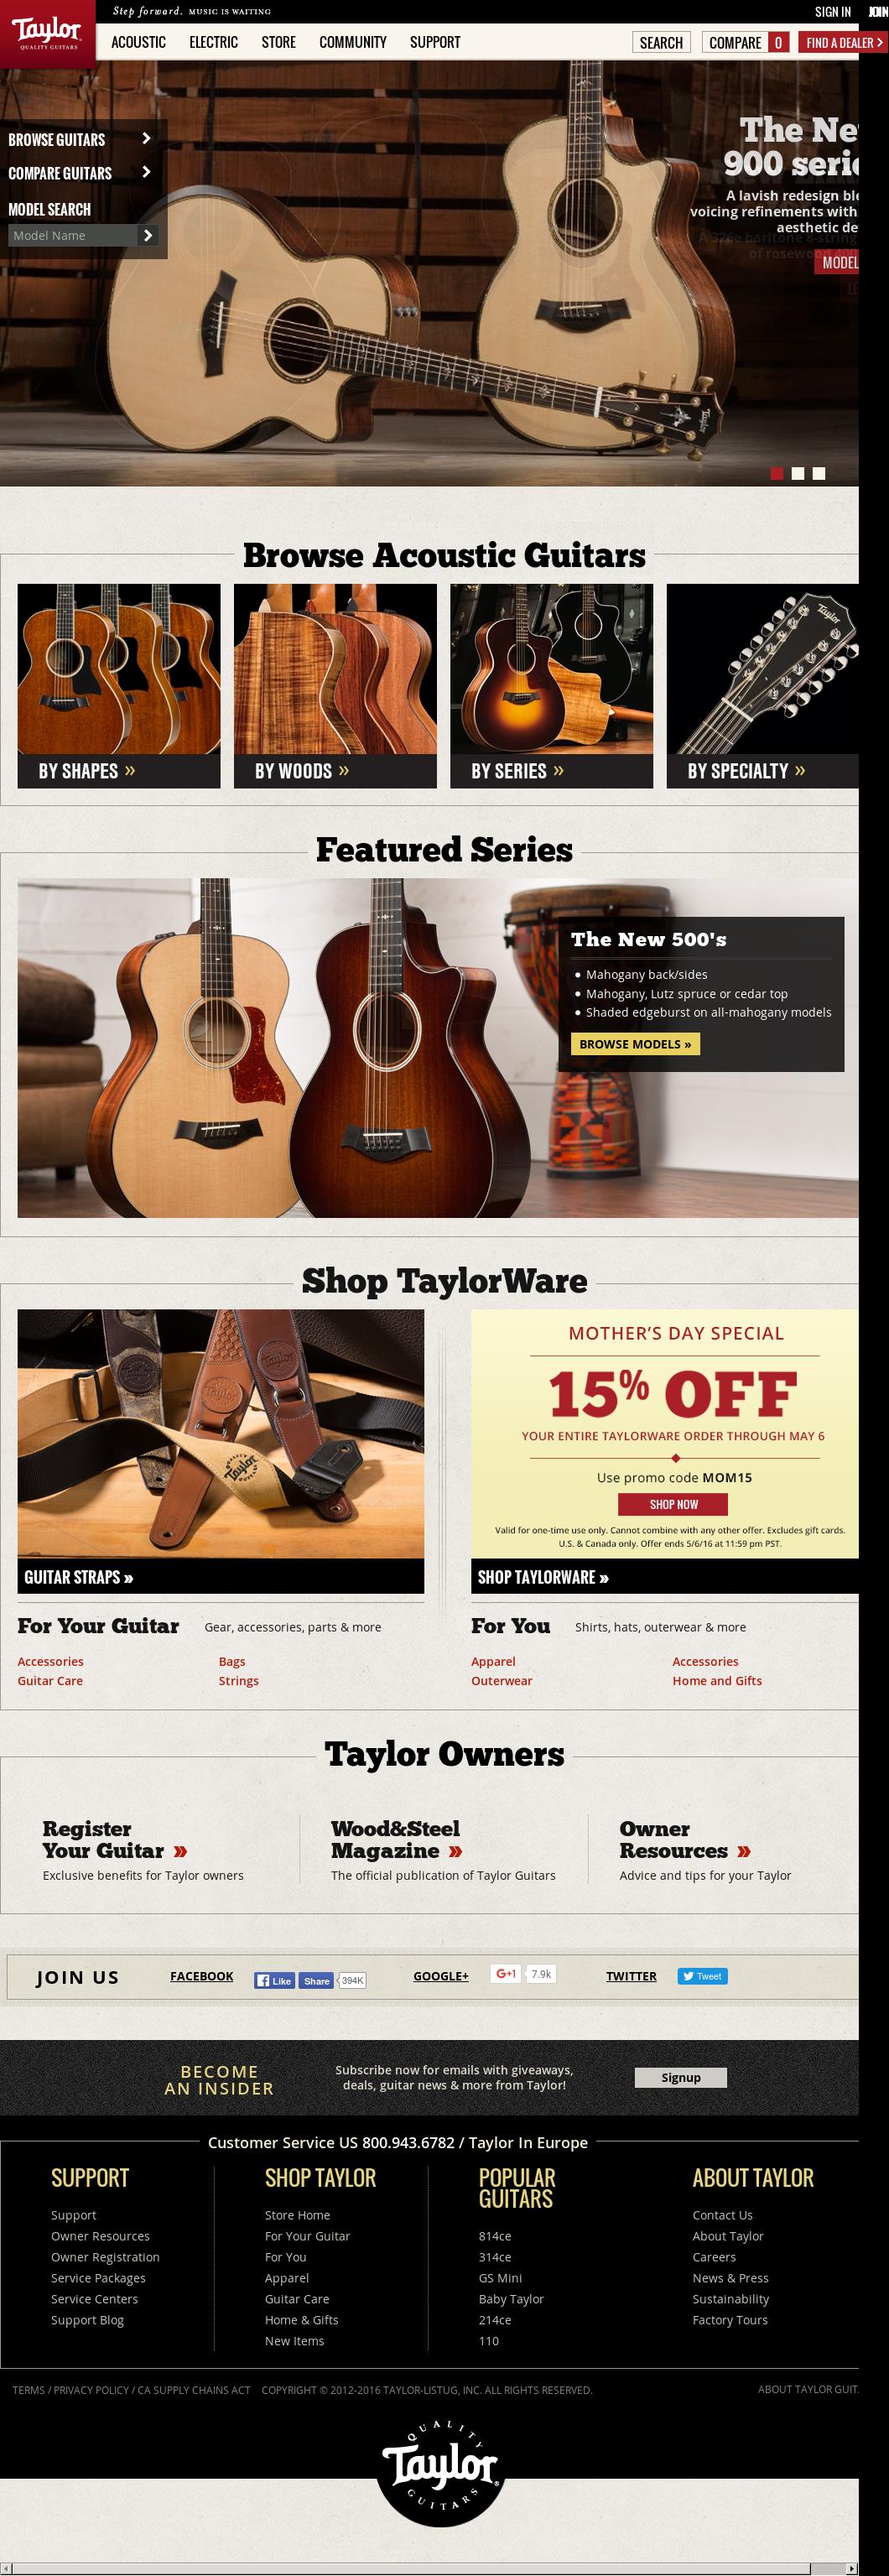 Taylor Guitars Website History